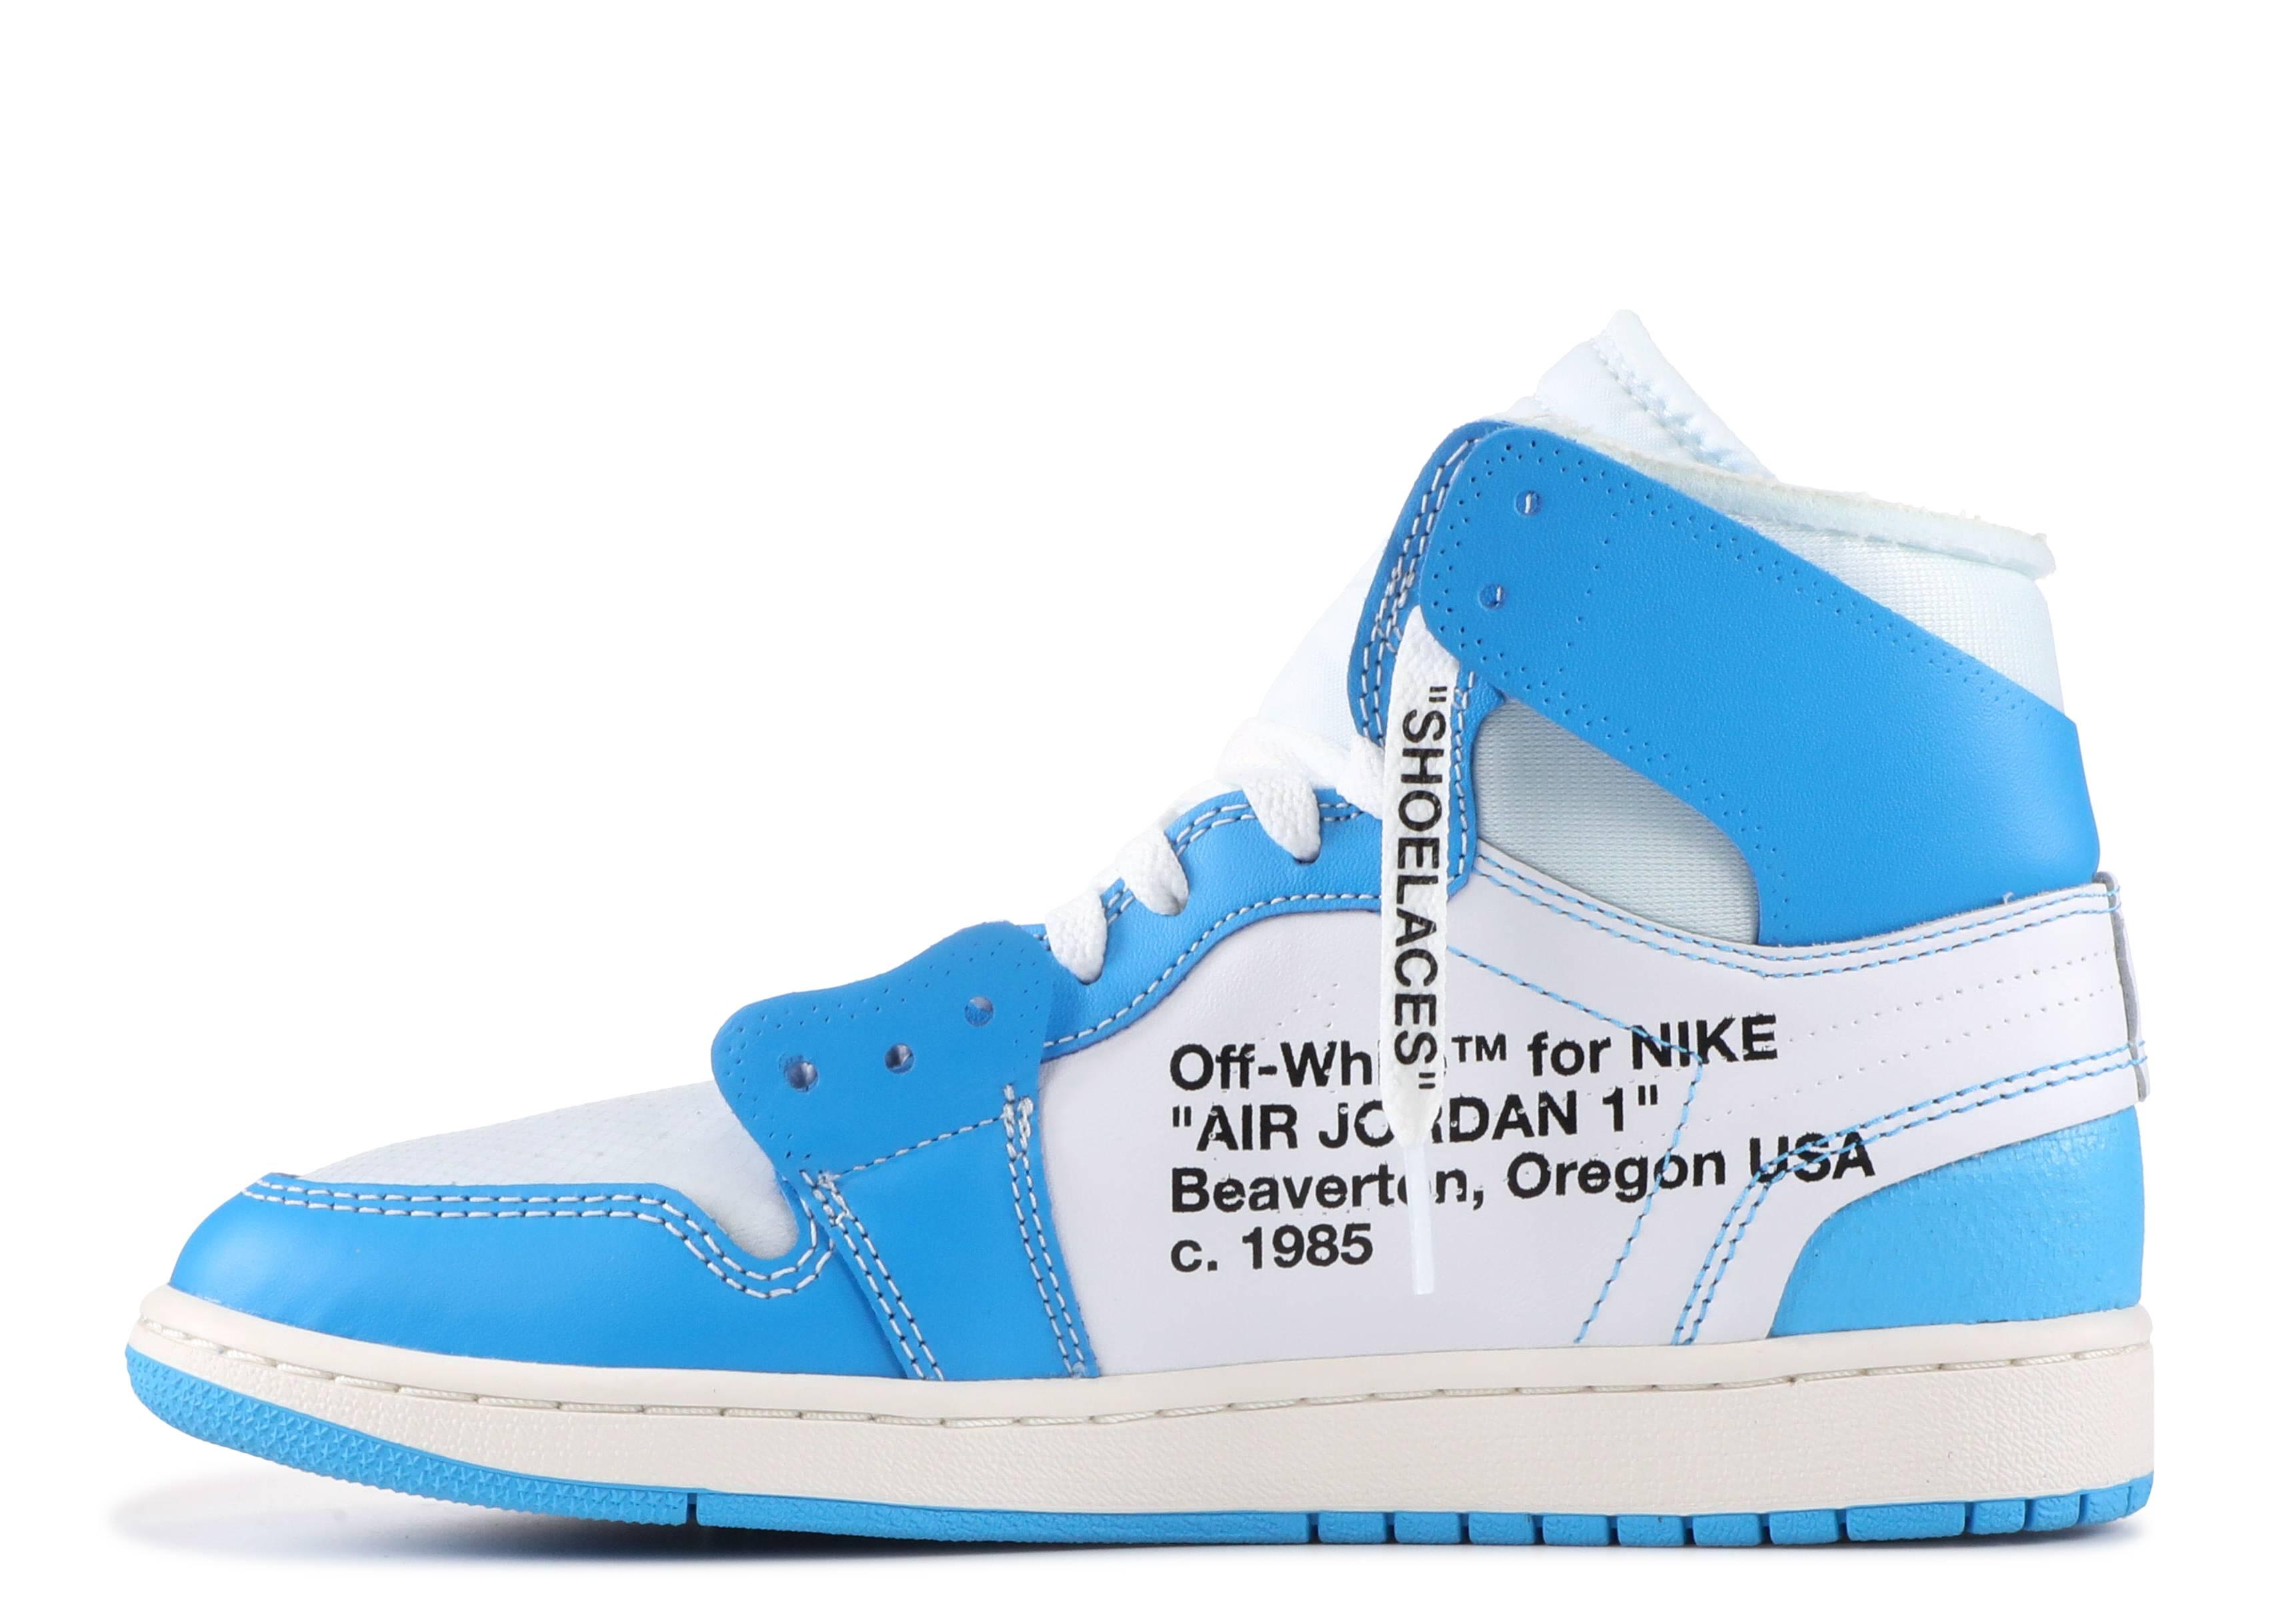 d307f6dabb82 Jordan 1 Retro High Off-white